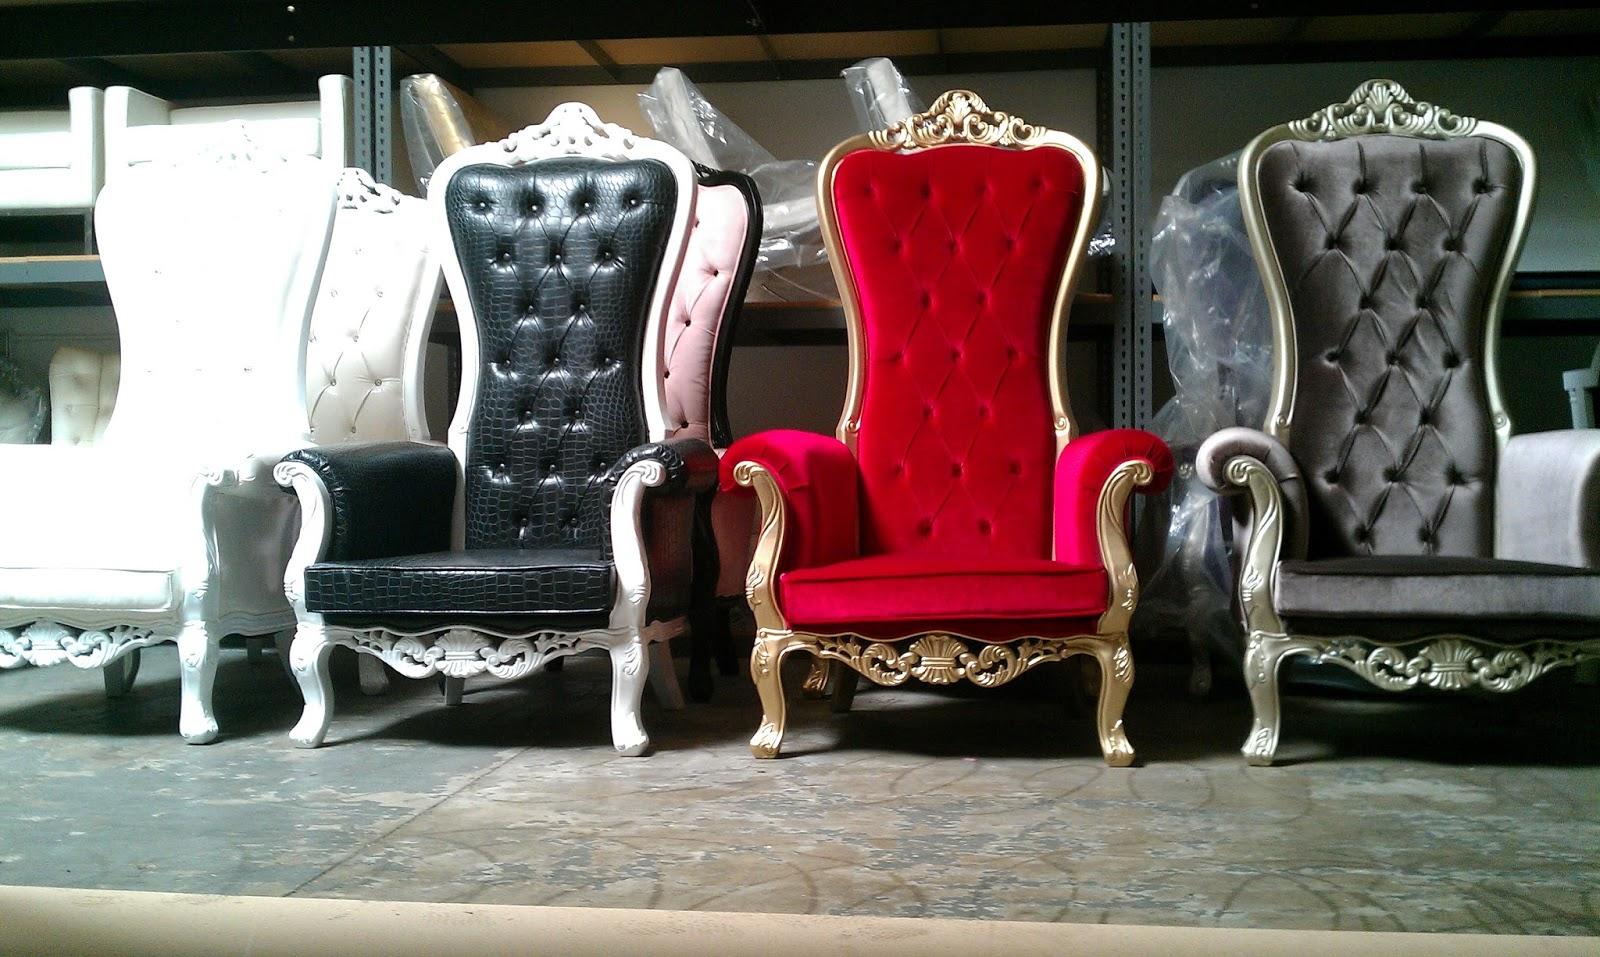 Peachy The Mod Spot Mcr 1 Throne Rental Prop Company In Oc Evergreenethics Interior Chair Design Evergreenethicsorg